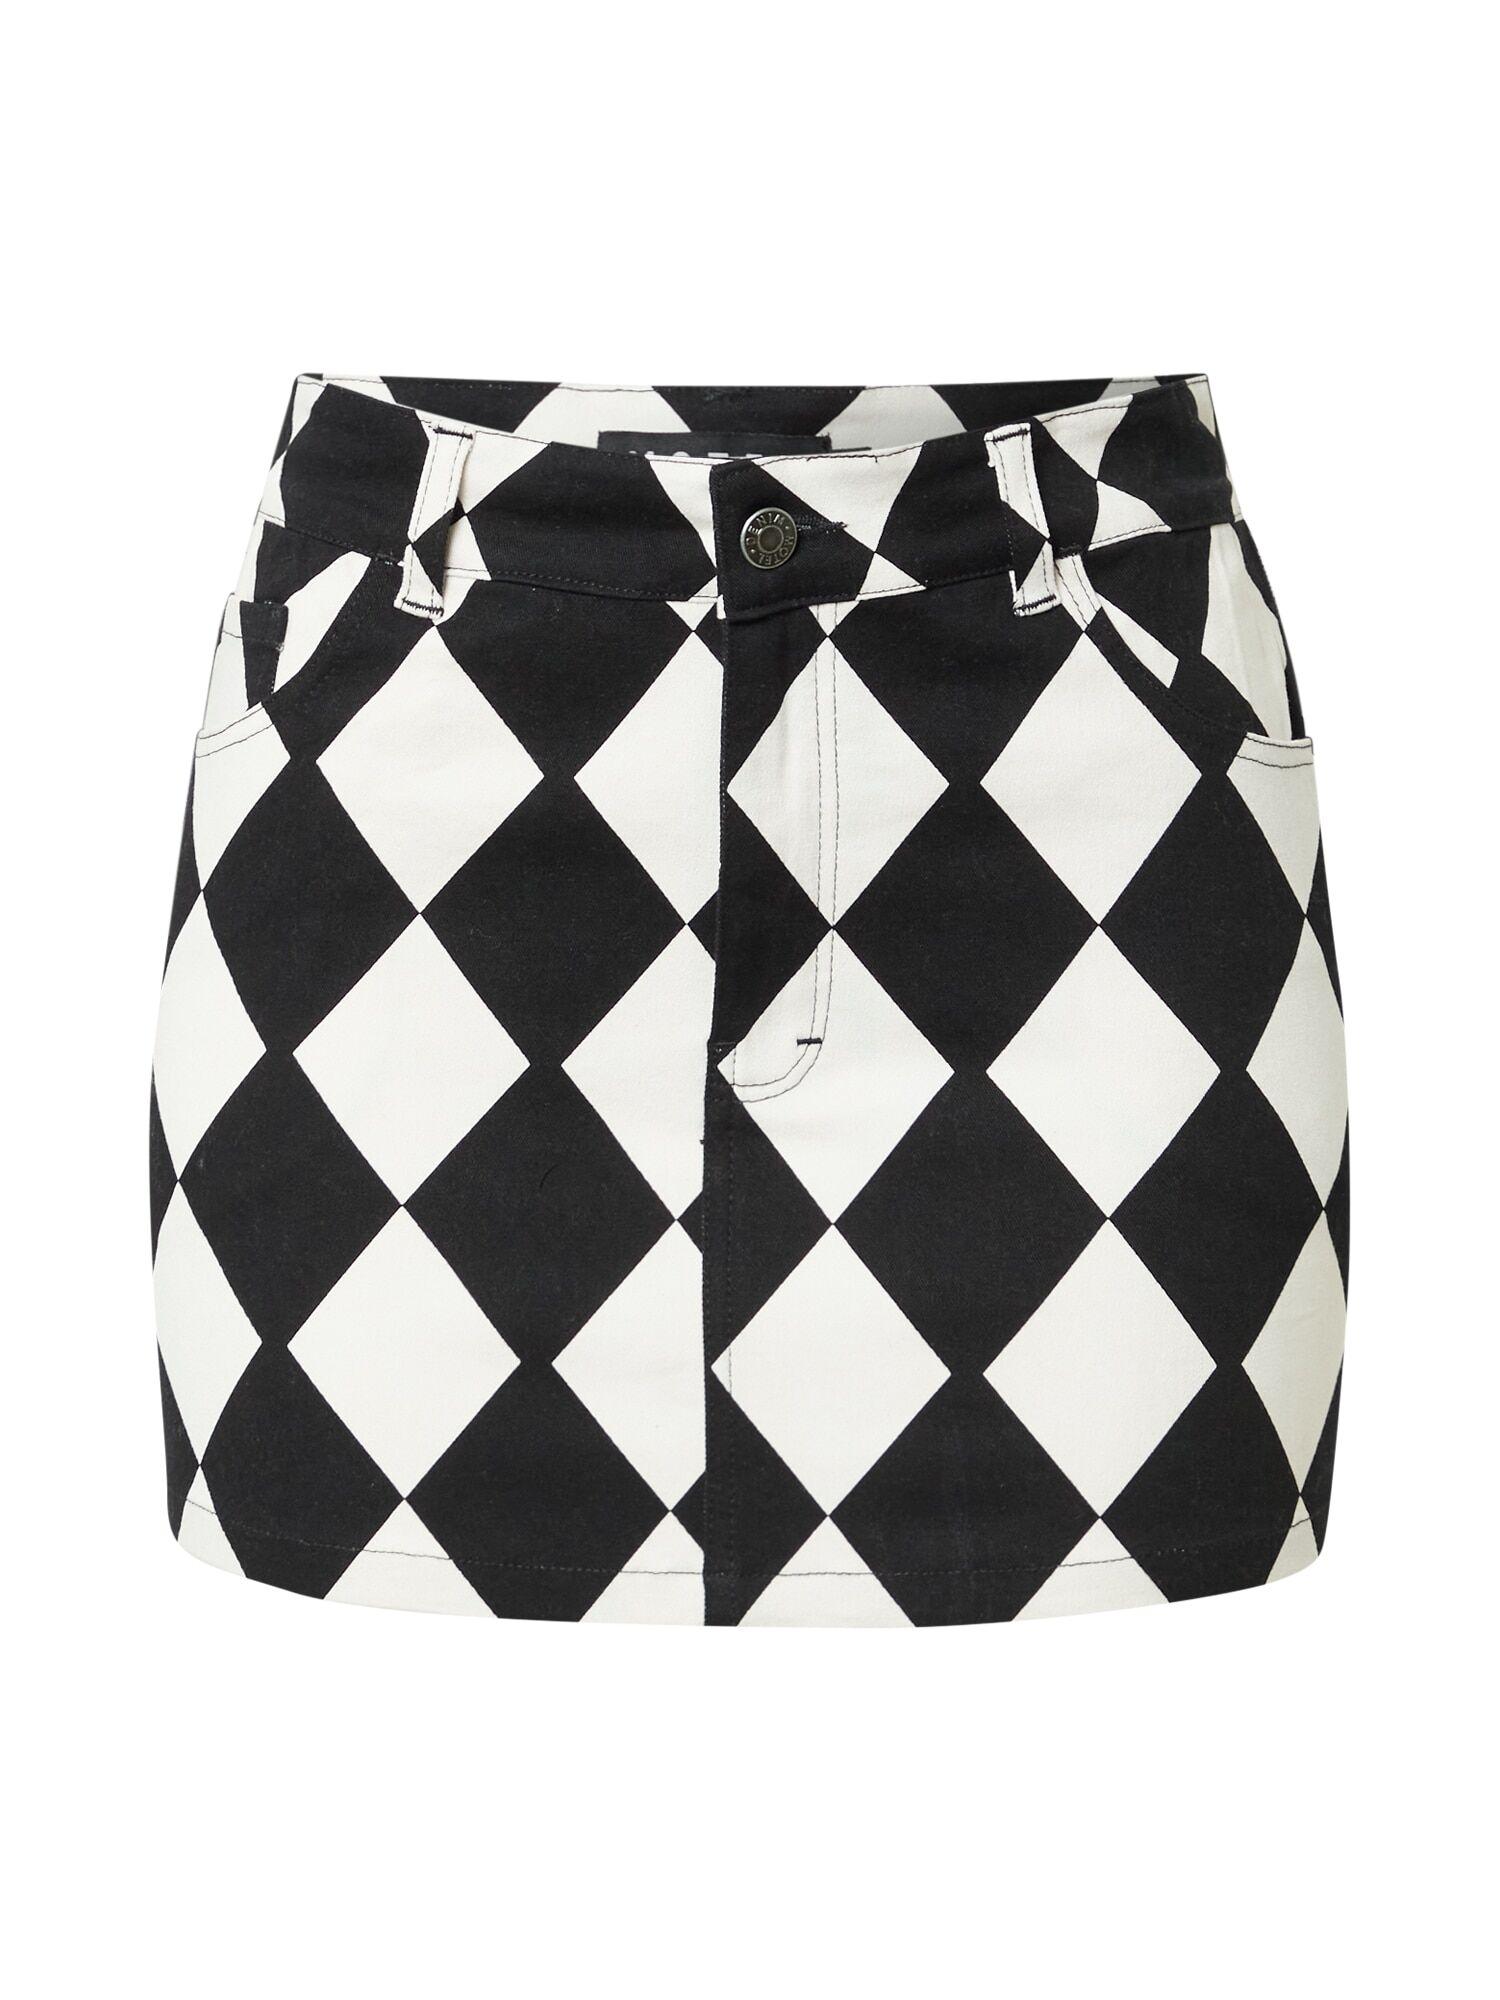 Motel Jupe 'Micro Broomy'  - Noir, Blanc - Taille: S - female